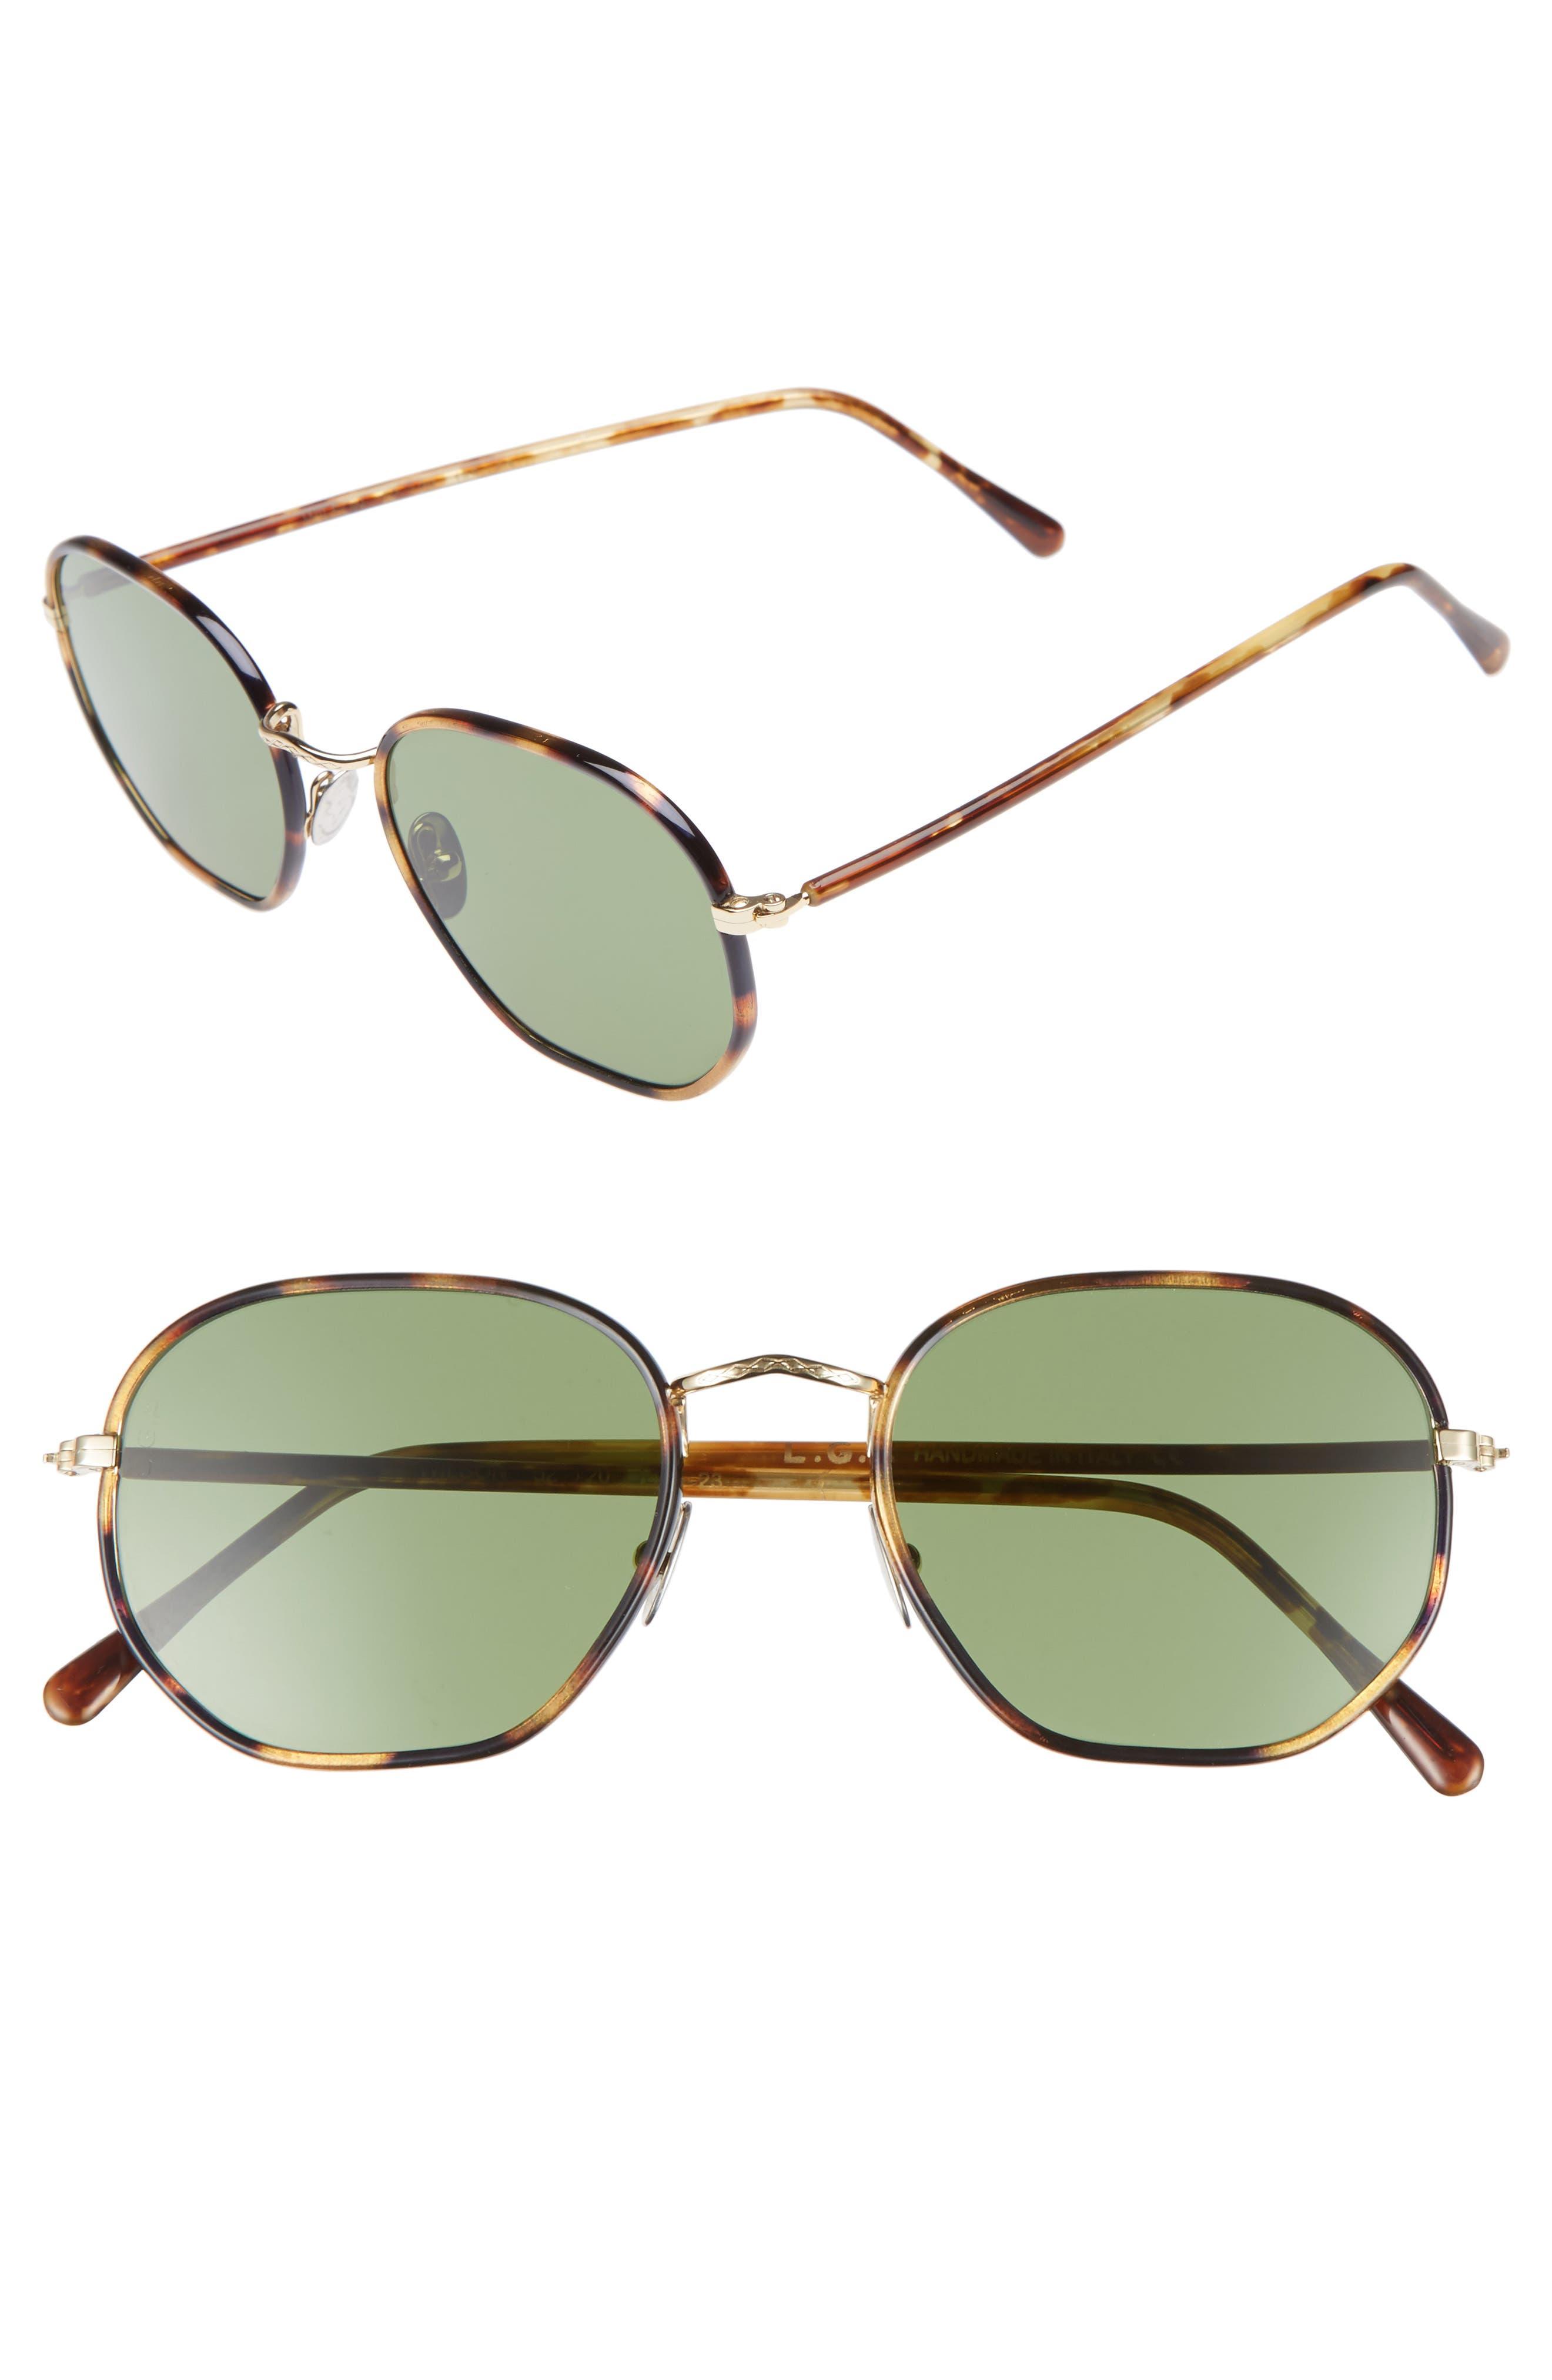 Wilson 52mm Sunglasses,                         Main,                         color, Havana Tartarugato/ Green